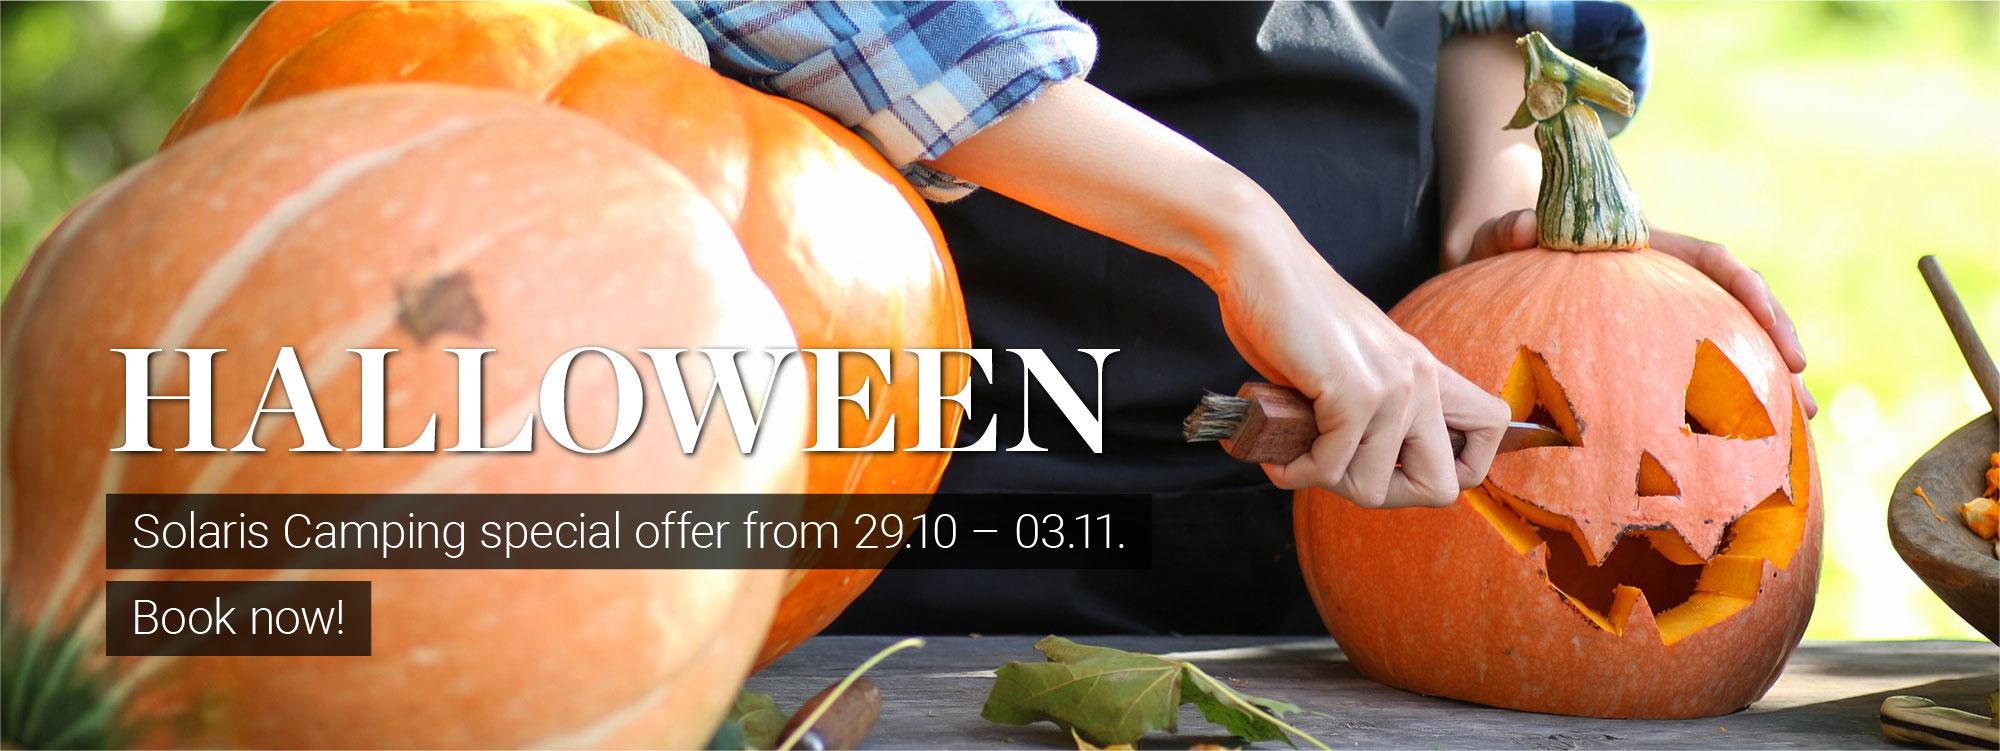 Web-slider-Halloween-2021-01